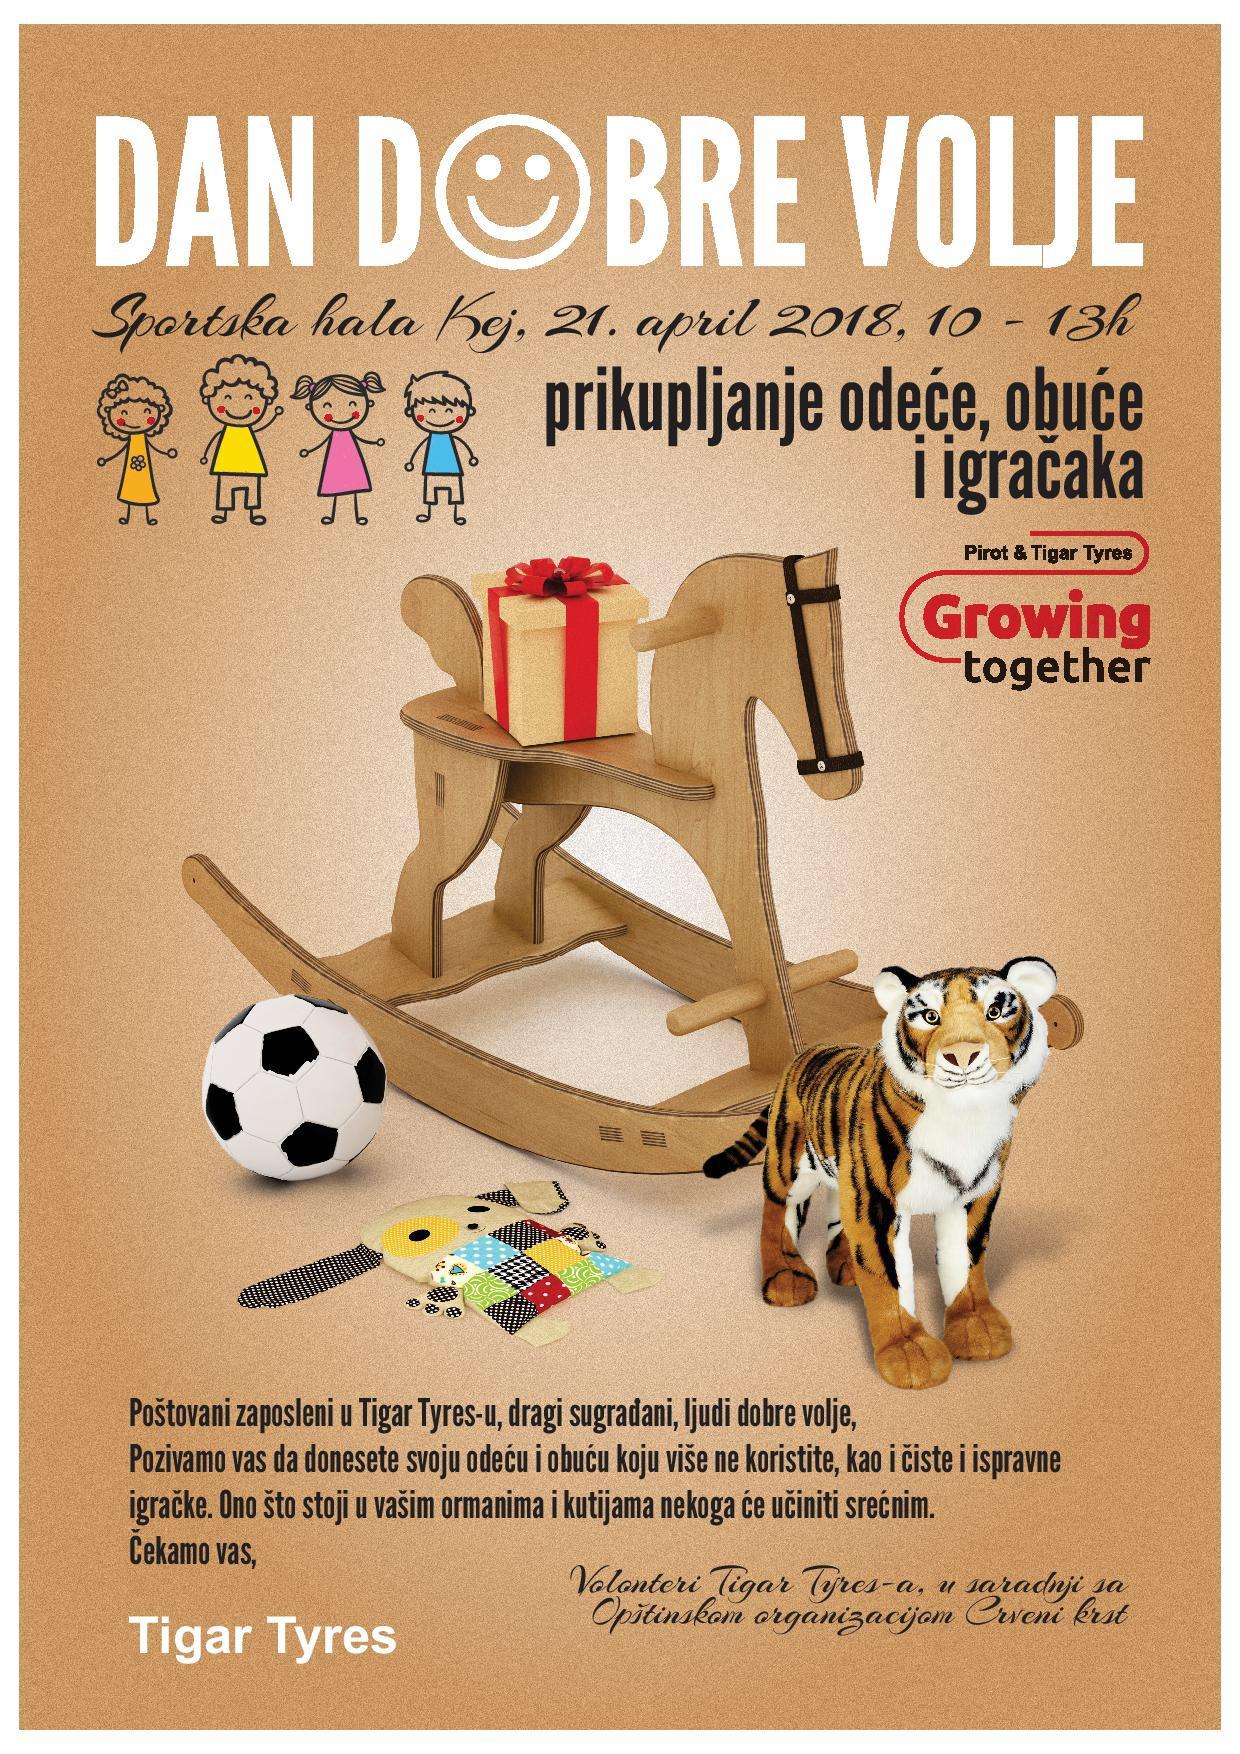 Photo of Tigar tajers organizuje Dan dobre volje u hali Kej